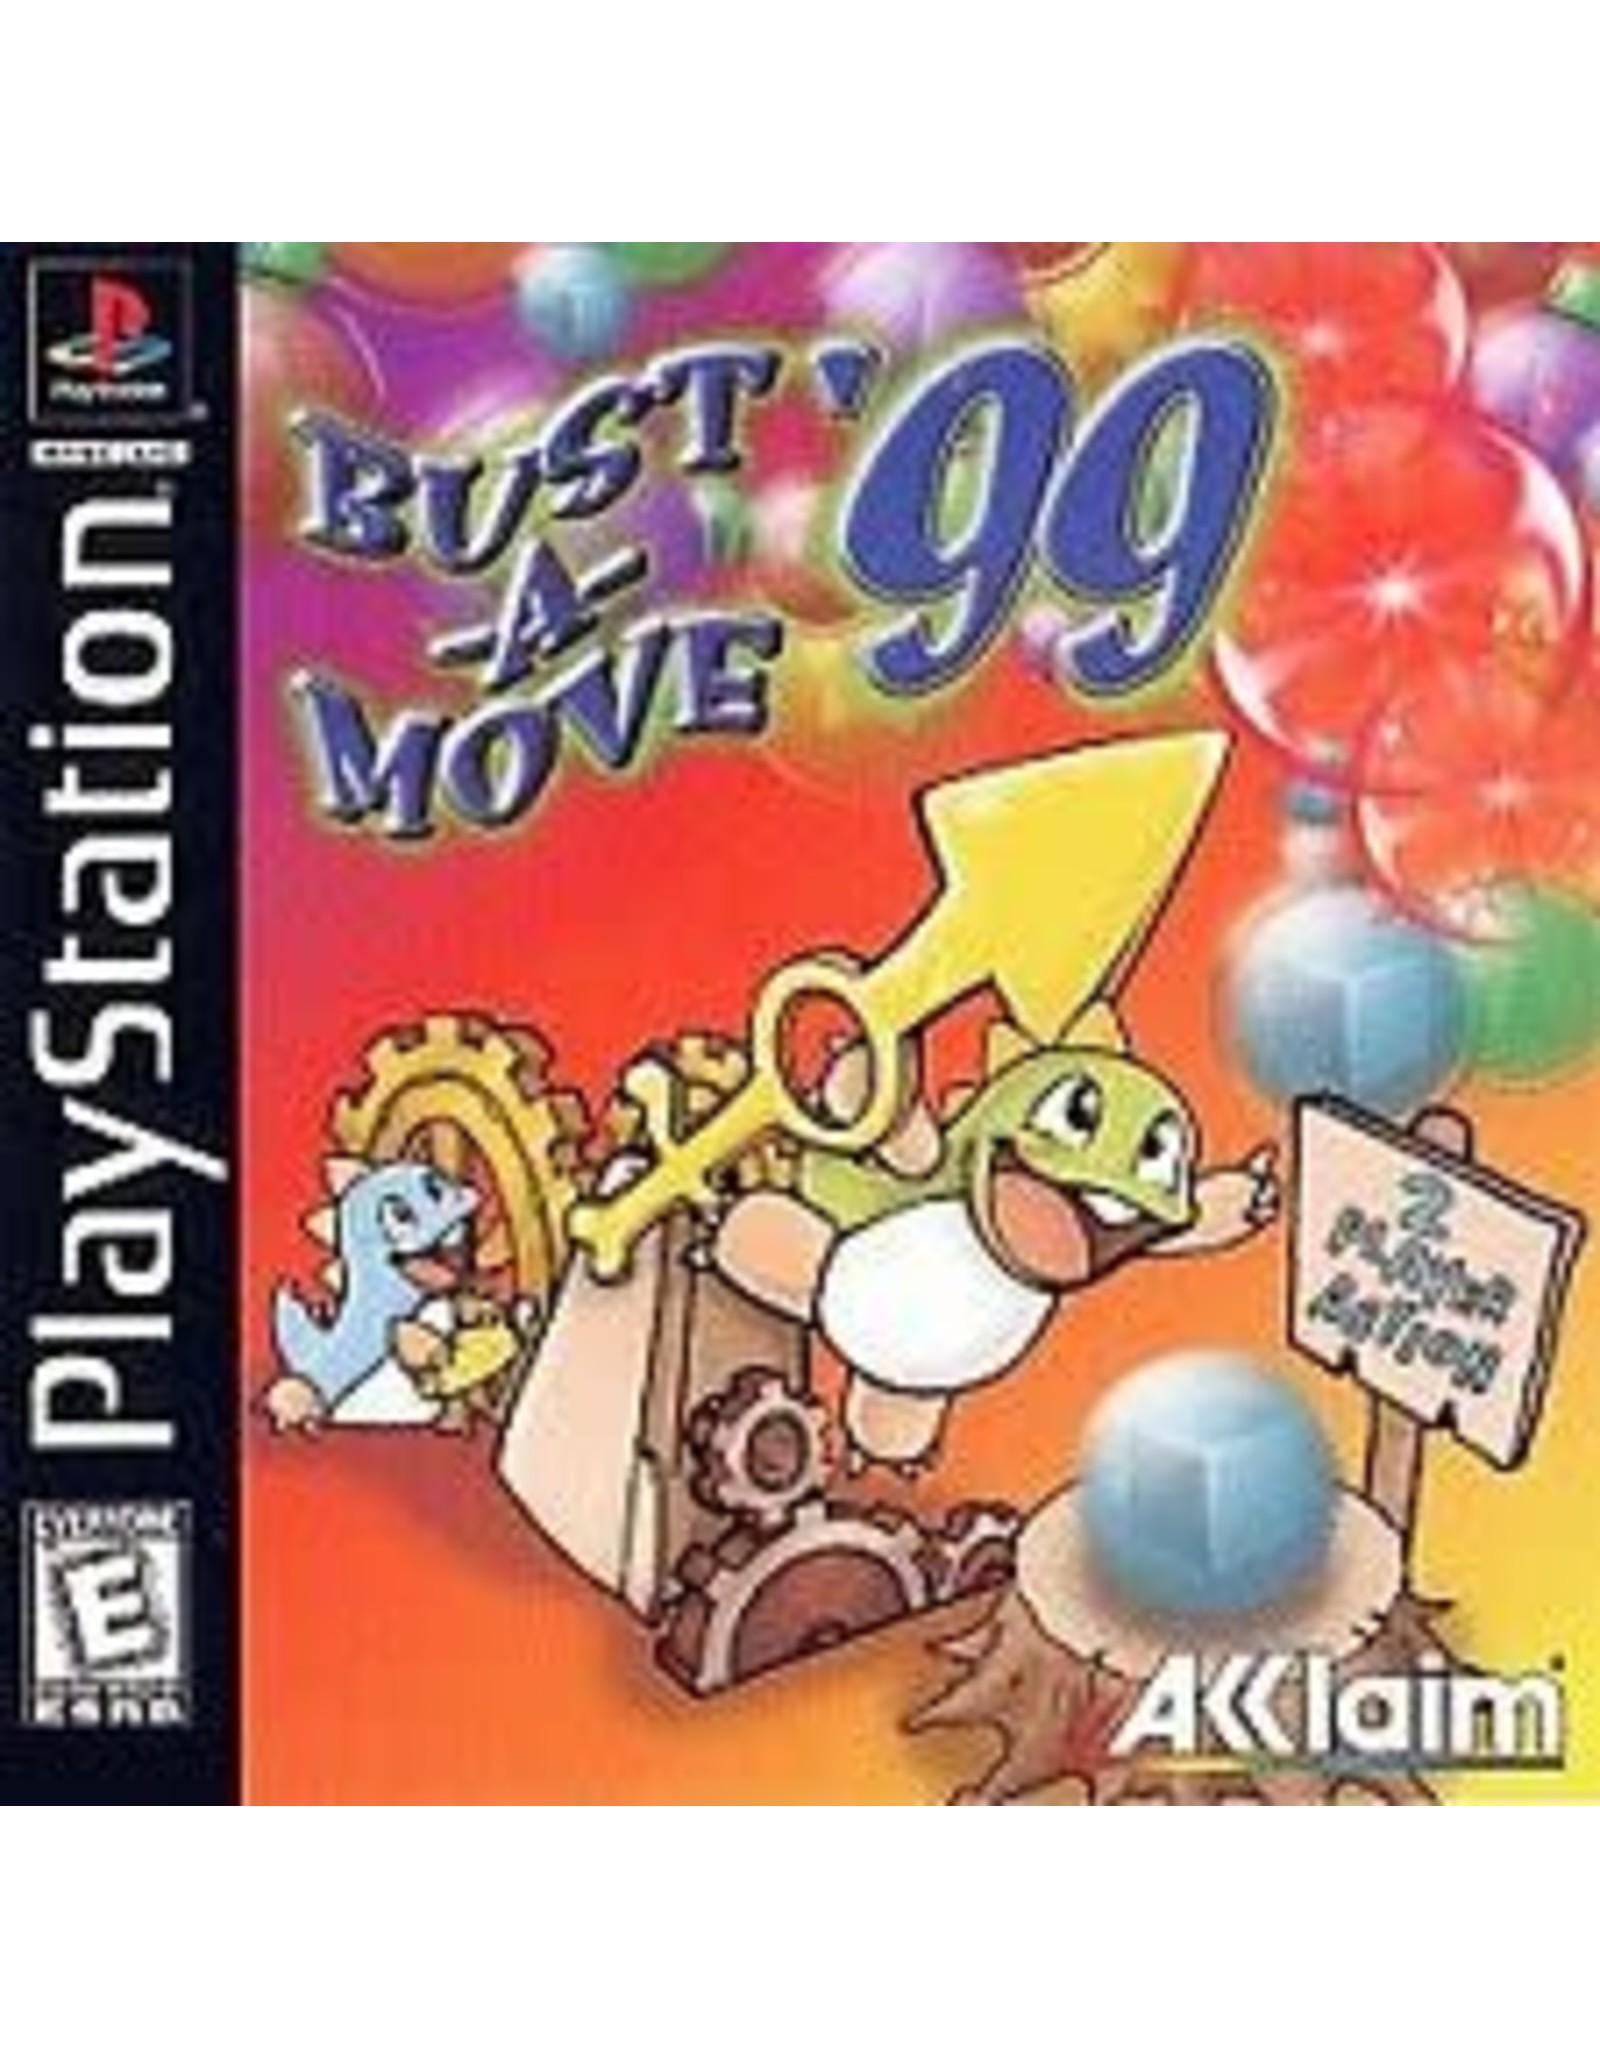 Playstation Bust-A-Move 99 (CiB)